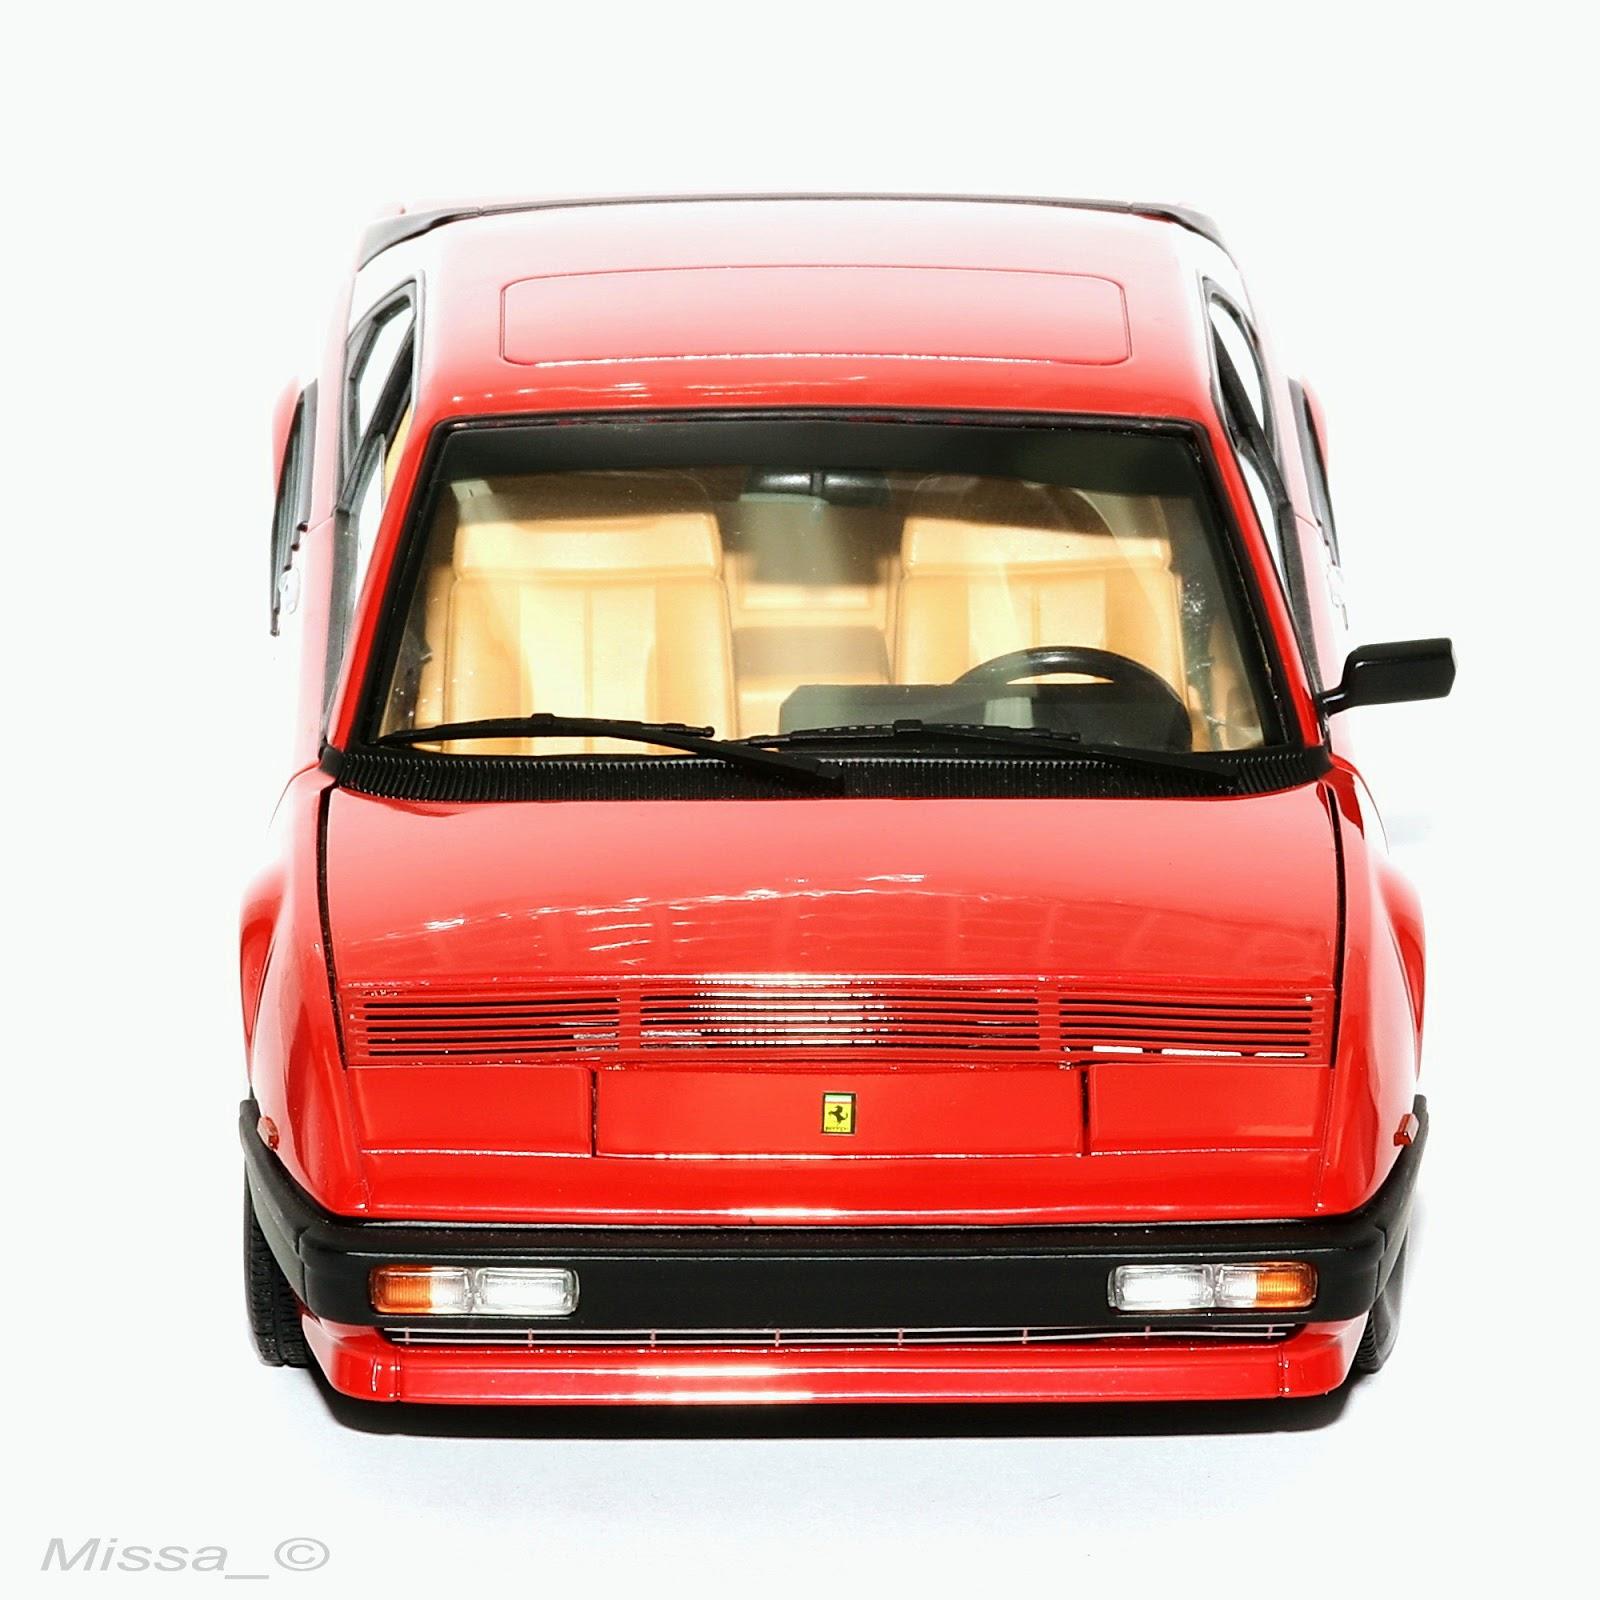 013_Elite_Ferrari%2BMondial%2B8_b Fabulous Ferrari Mondial 8 Super Elite Cars Trend